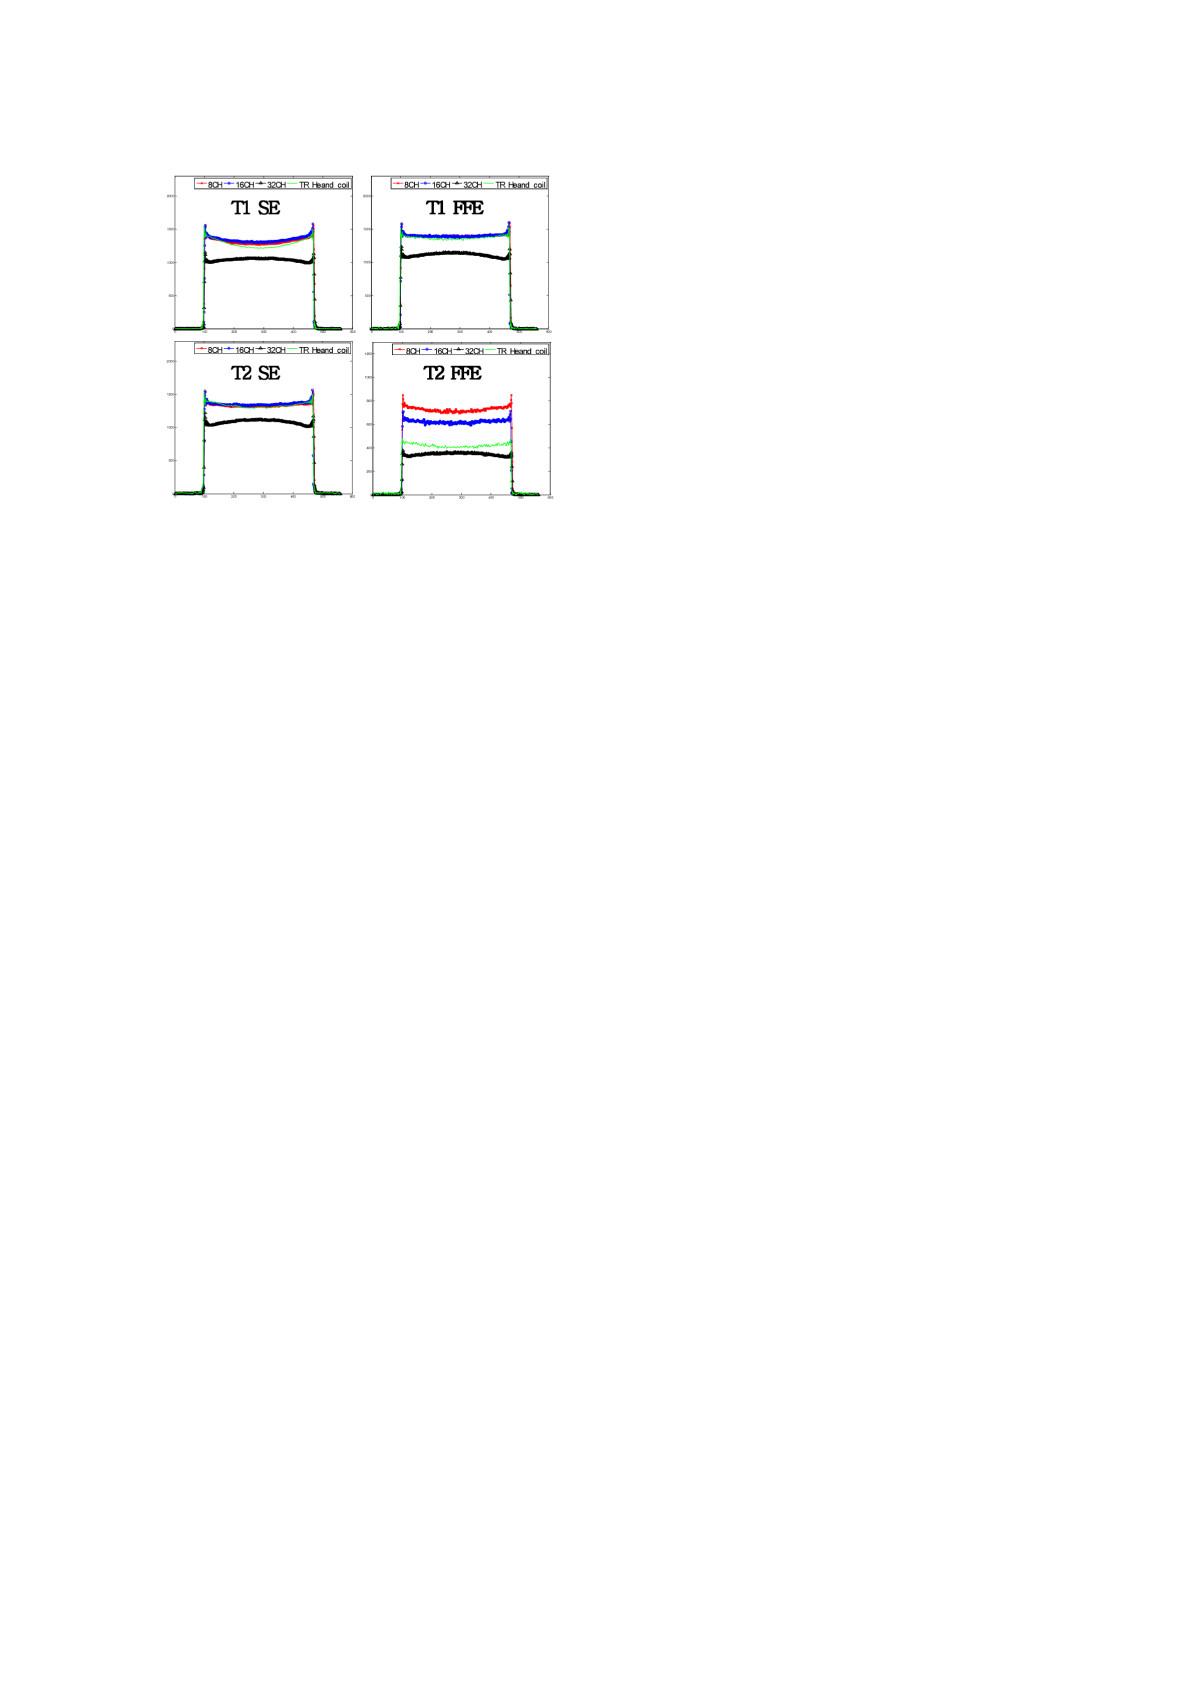 https://static-content.springer.com/image/art%3A10.1186%2Fs40543-014-0025-2/MediaObjects/40543_2014_Article_25_Fig5_HTML.jpg